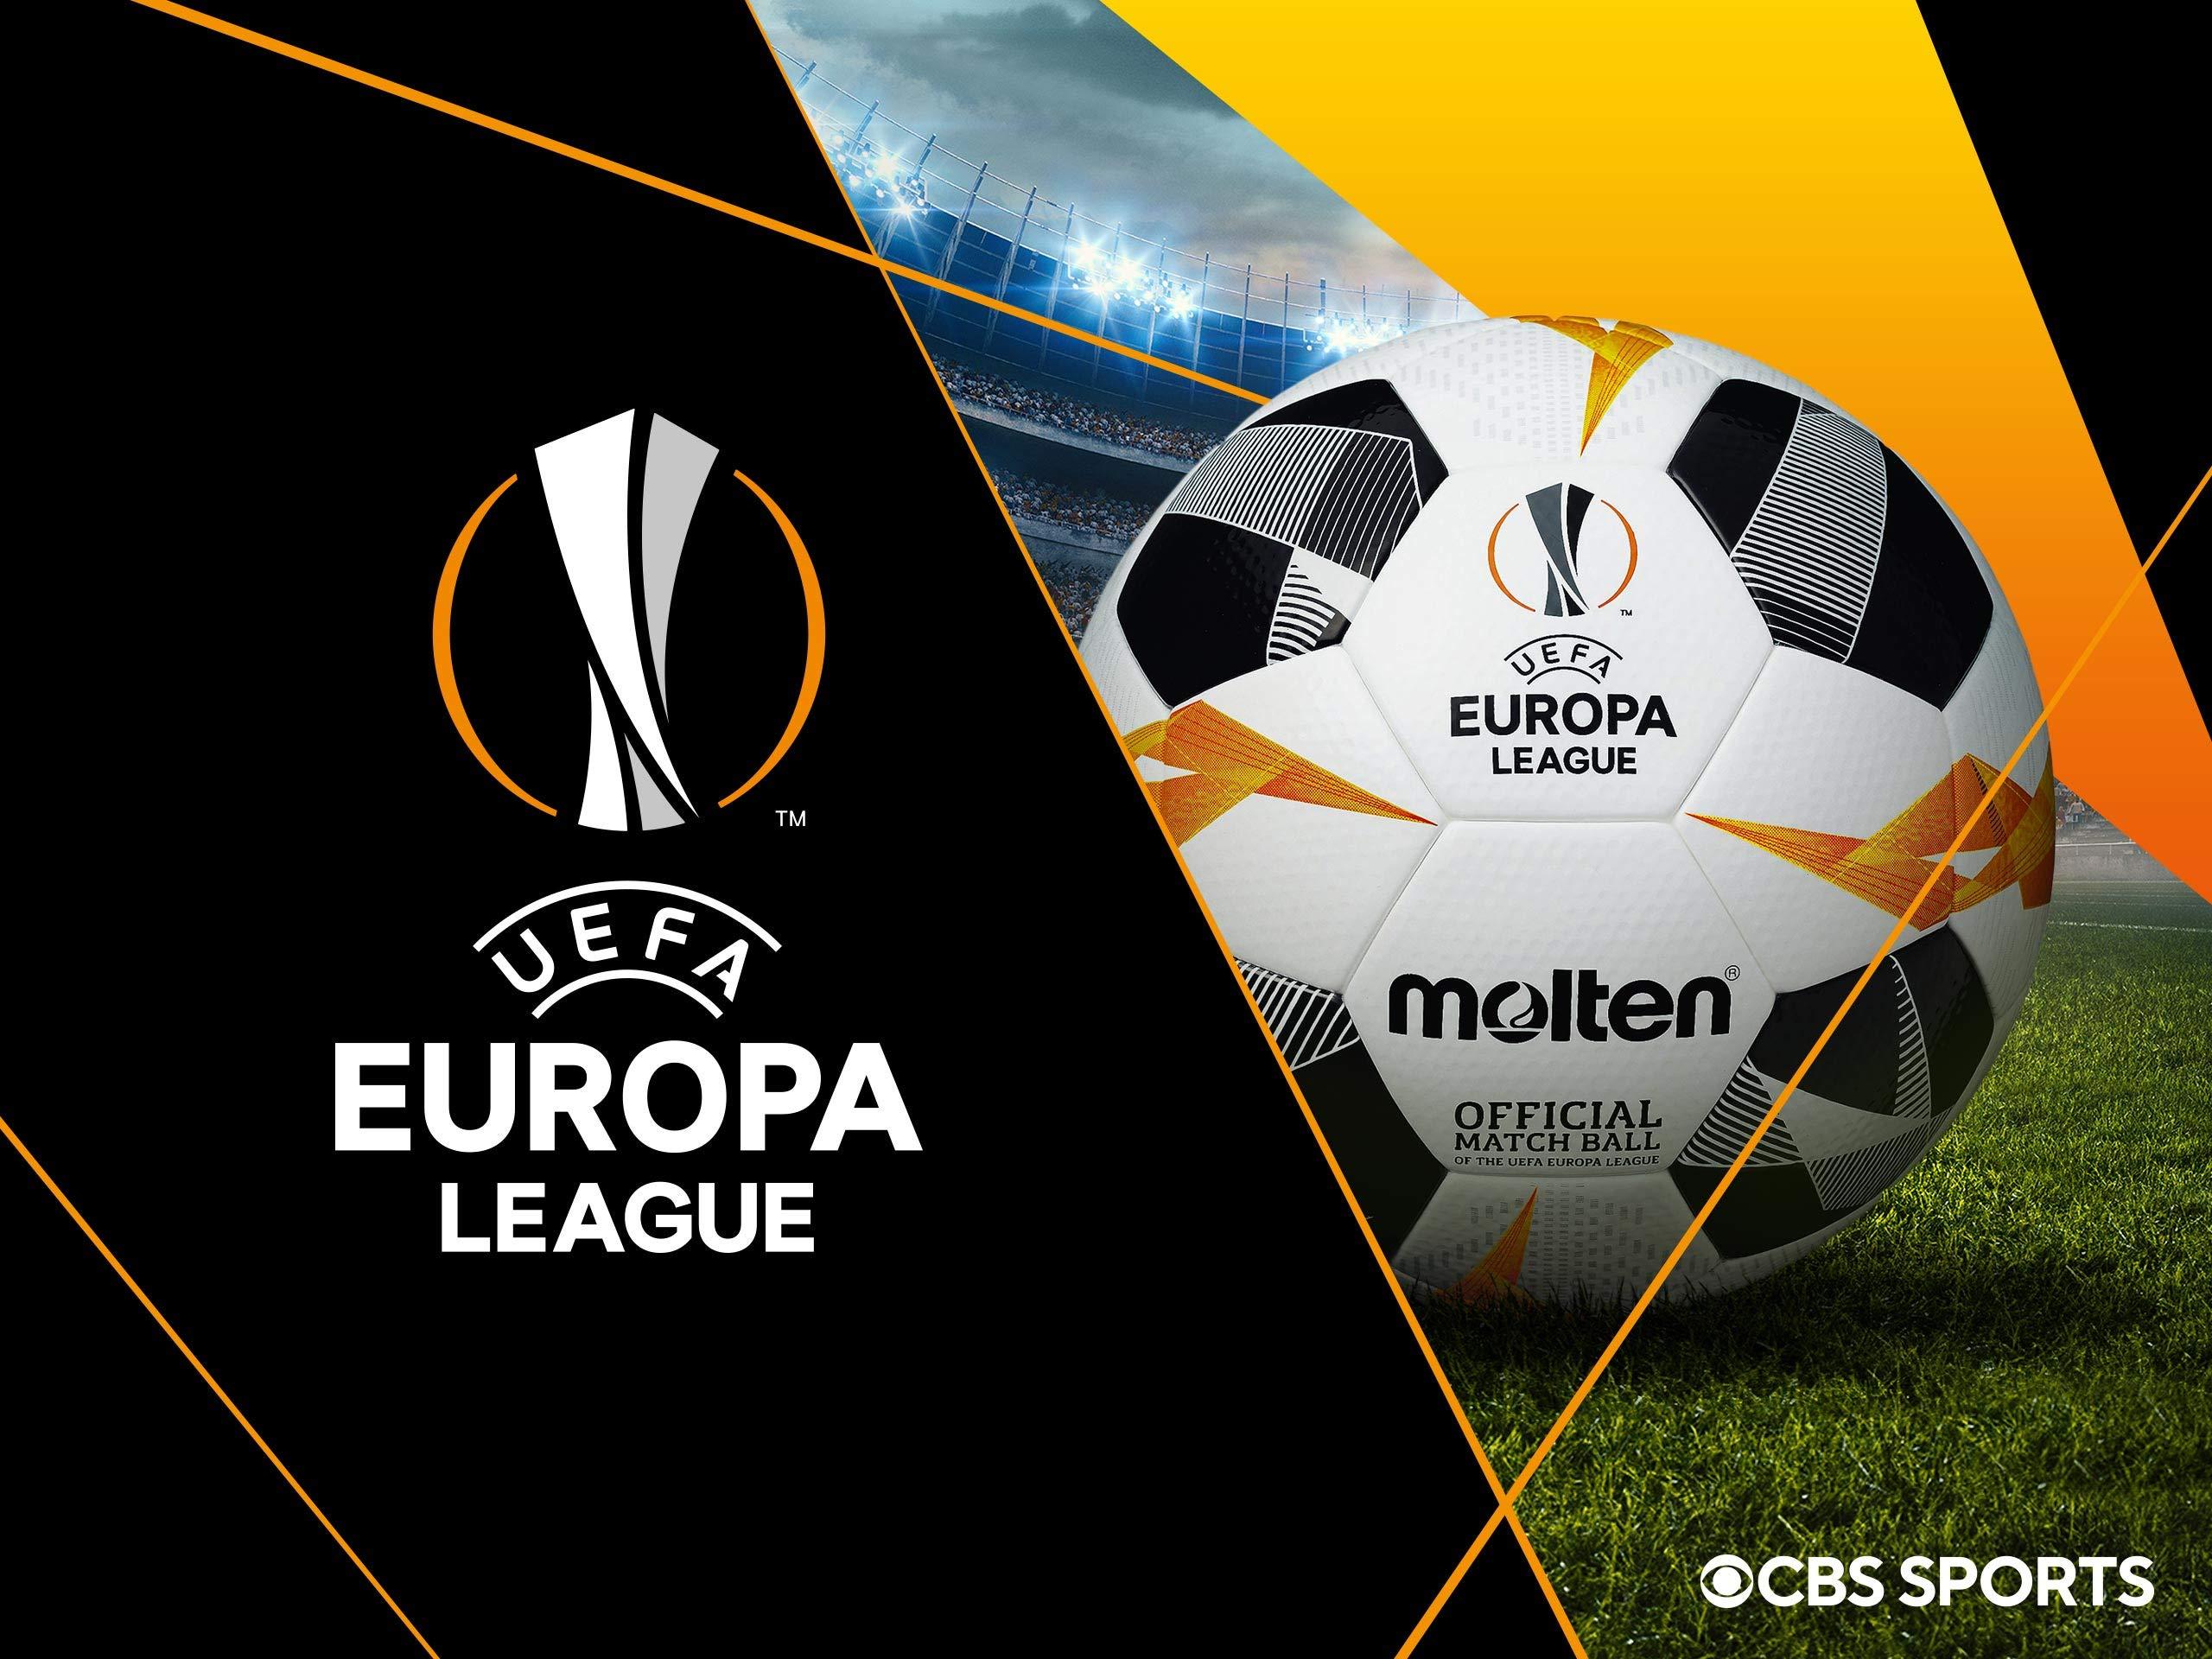 watch uefa europa league prime video watch uefa europa league prime video